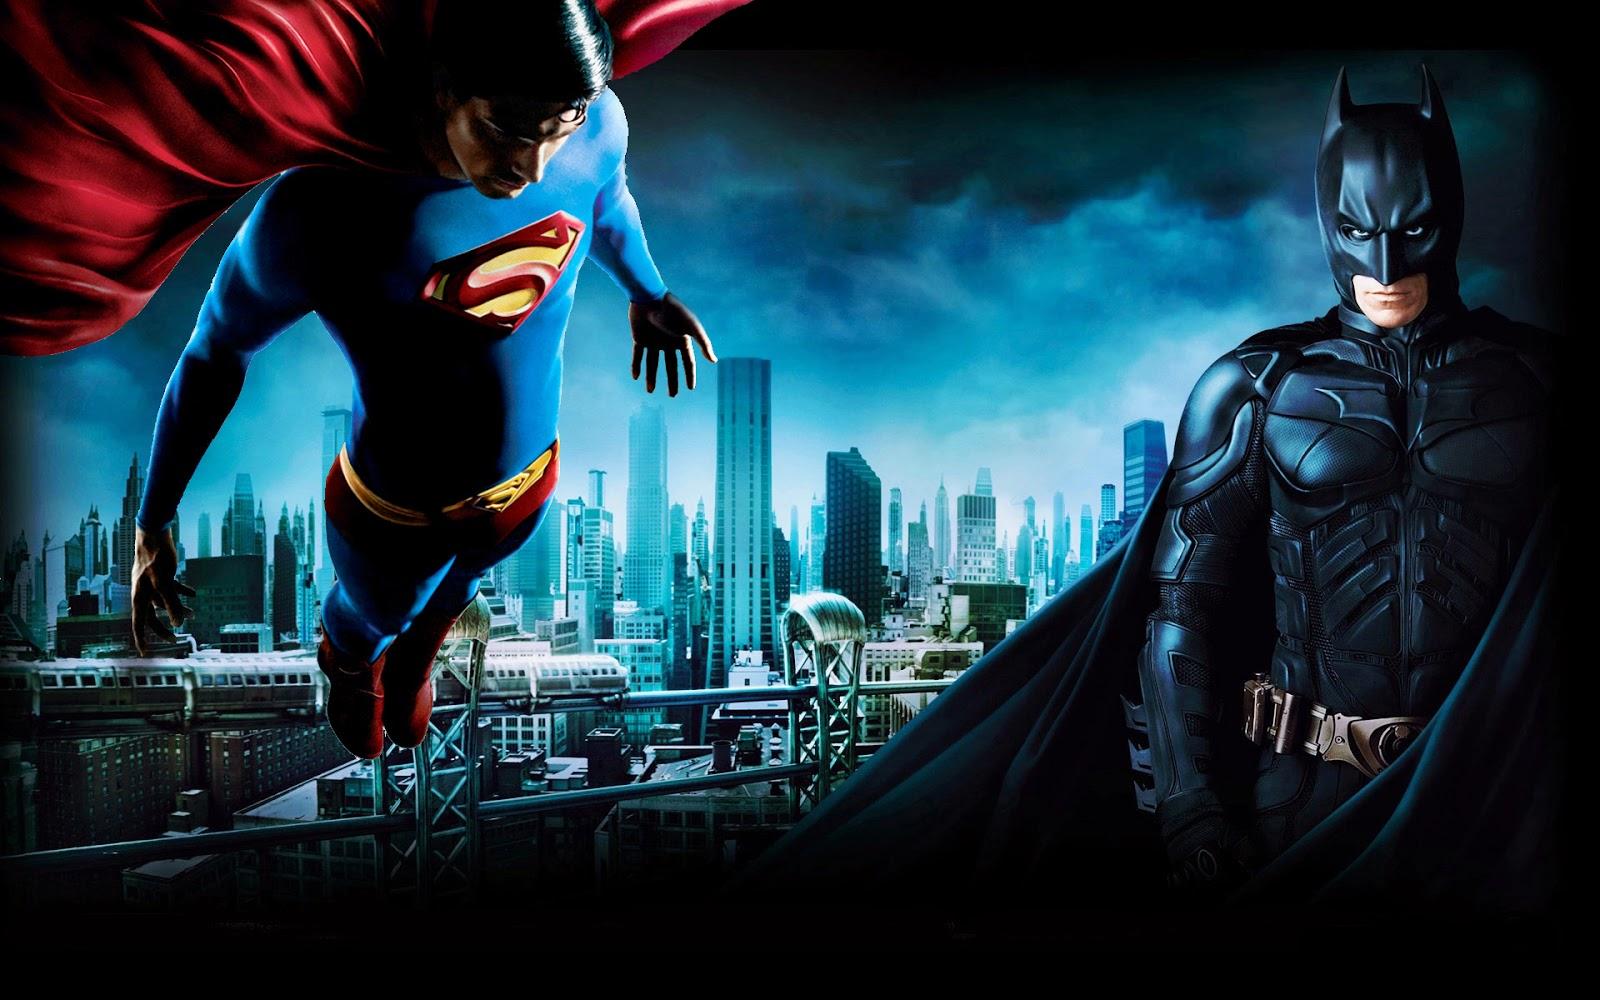 Batman Vs Superman HD Wallpapers Wallpaper Mansion 1600x1000